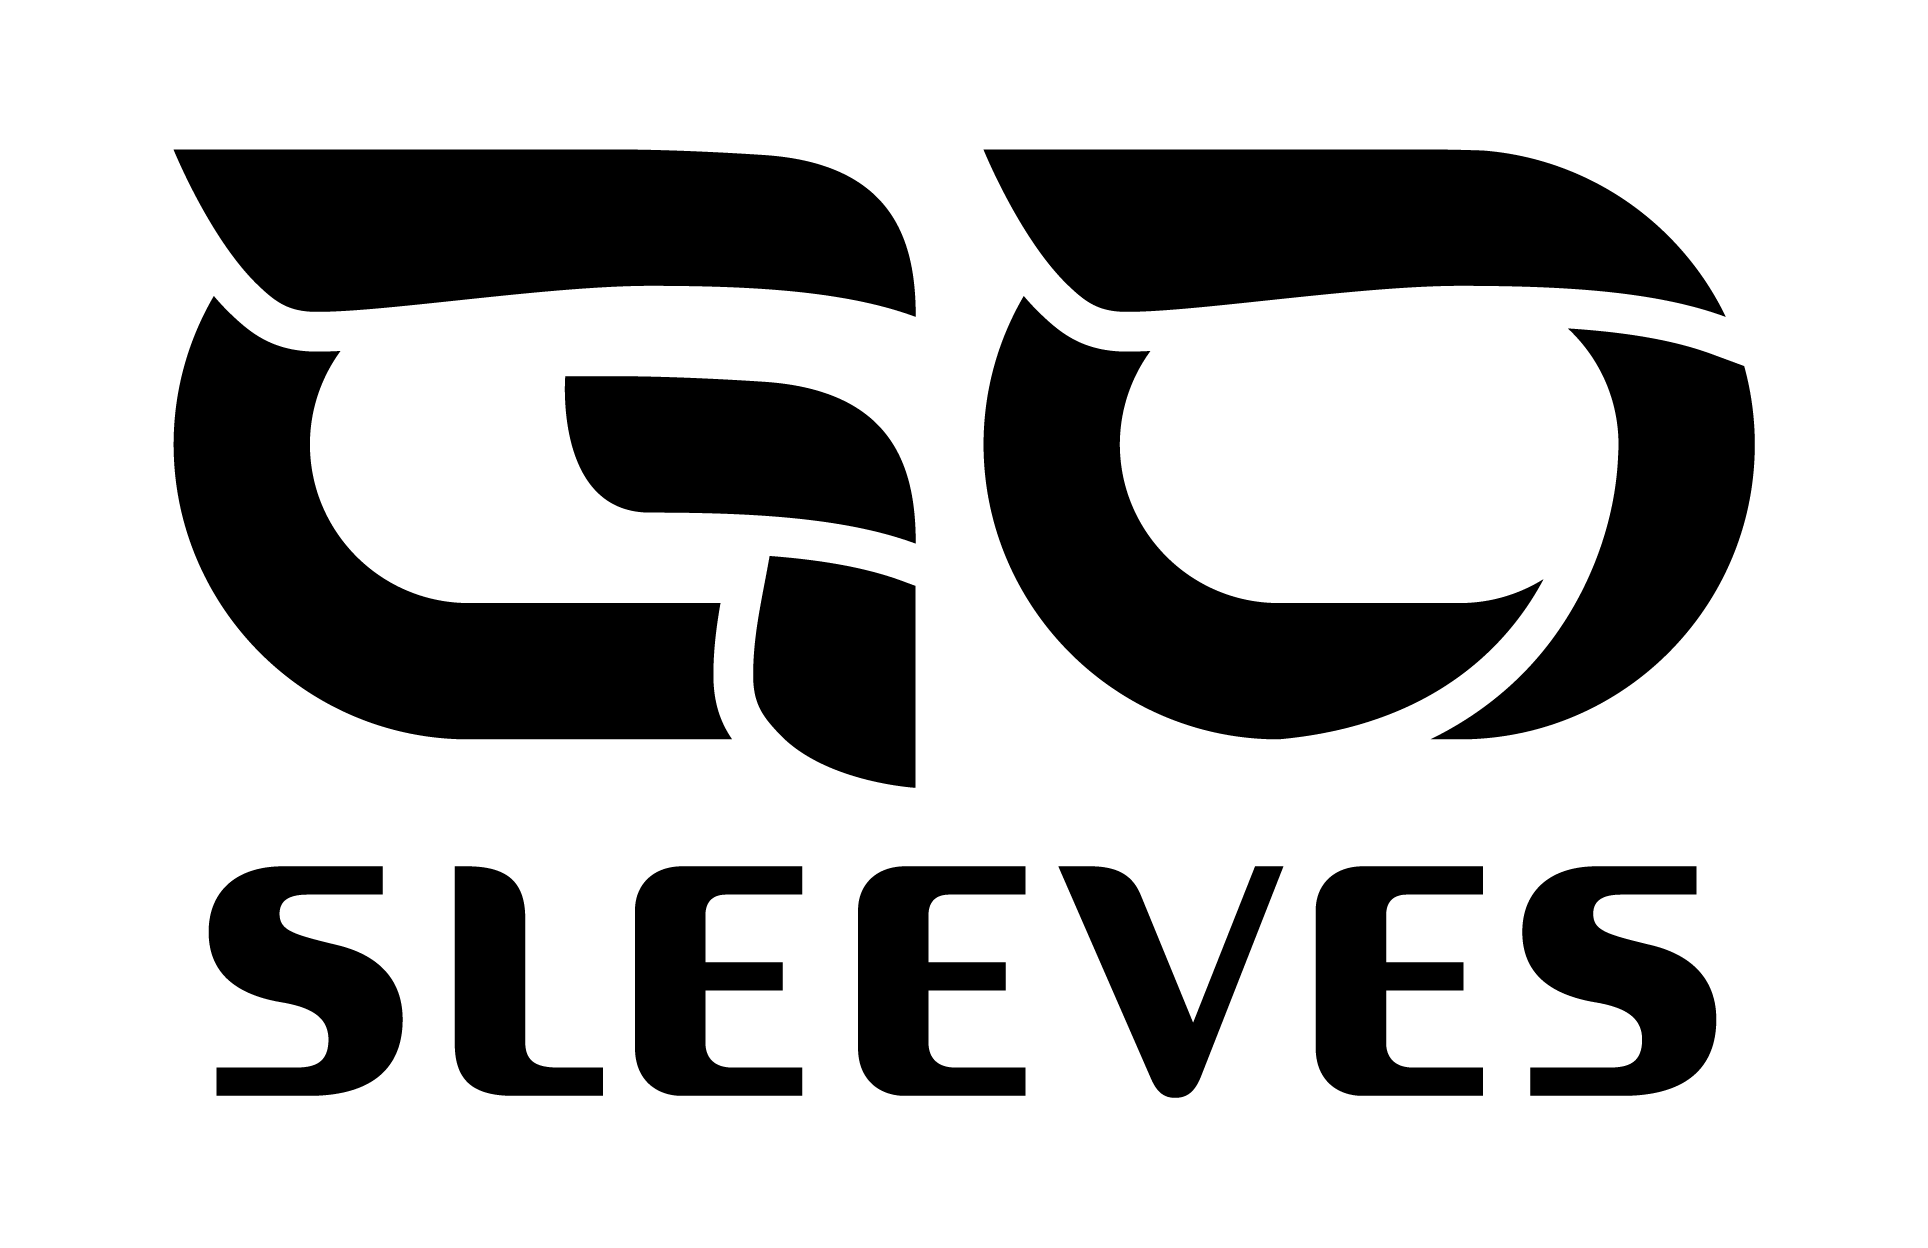 GO-Sleeves-Stacked-Black-RGB